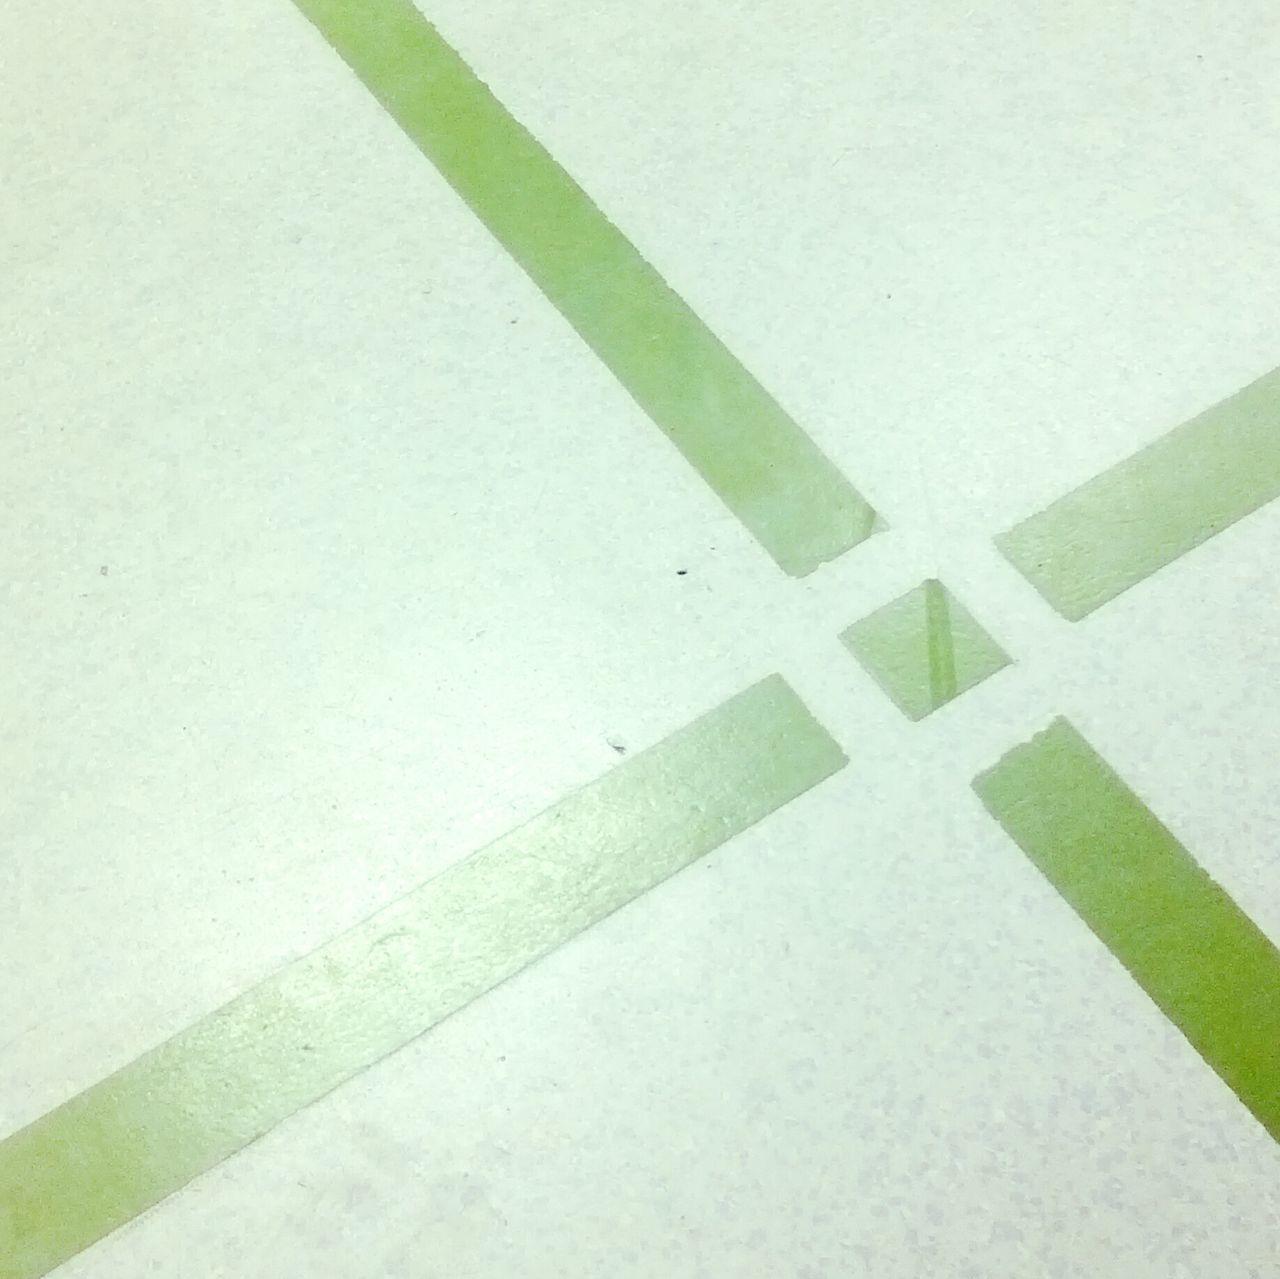 Sports Sports Geometric Shapes Details